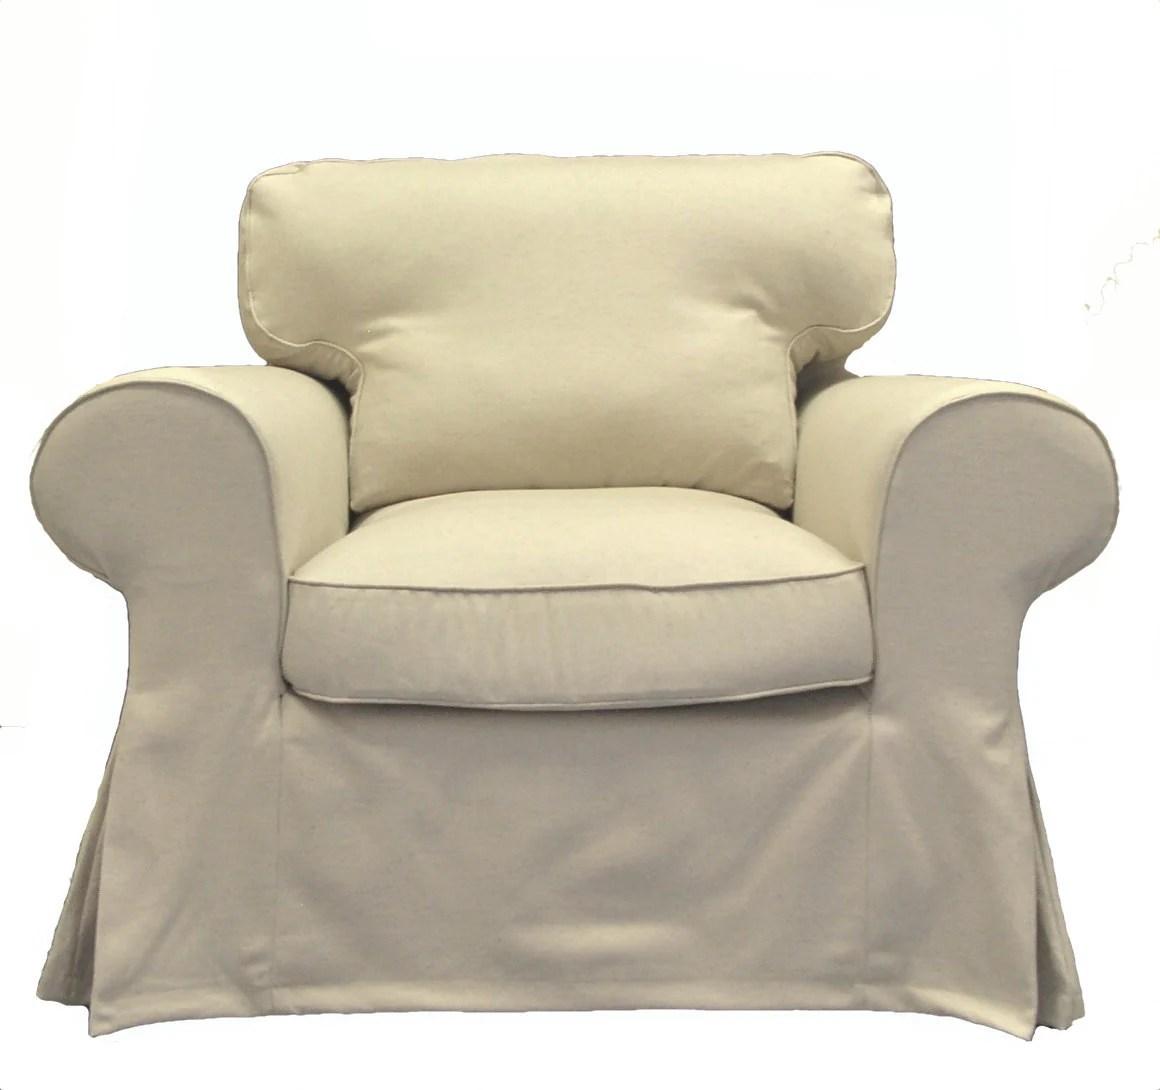 custom chair covers ikea professional barber chairs ektorp slipcover in oatmeal by freshknesting